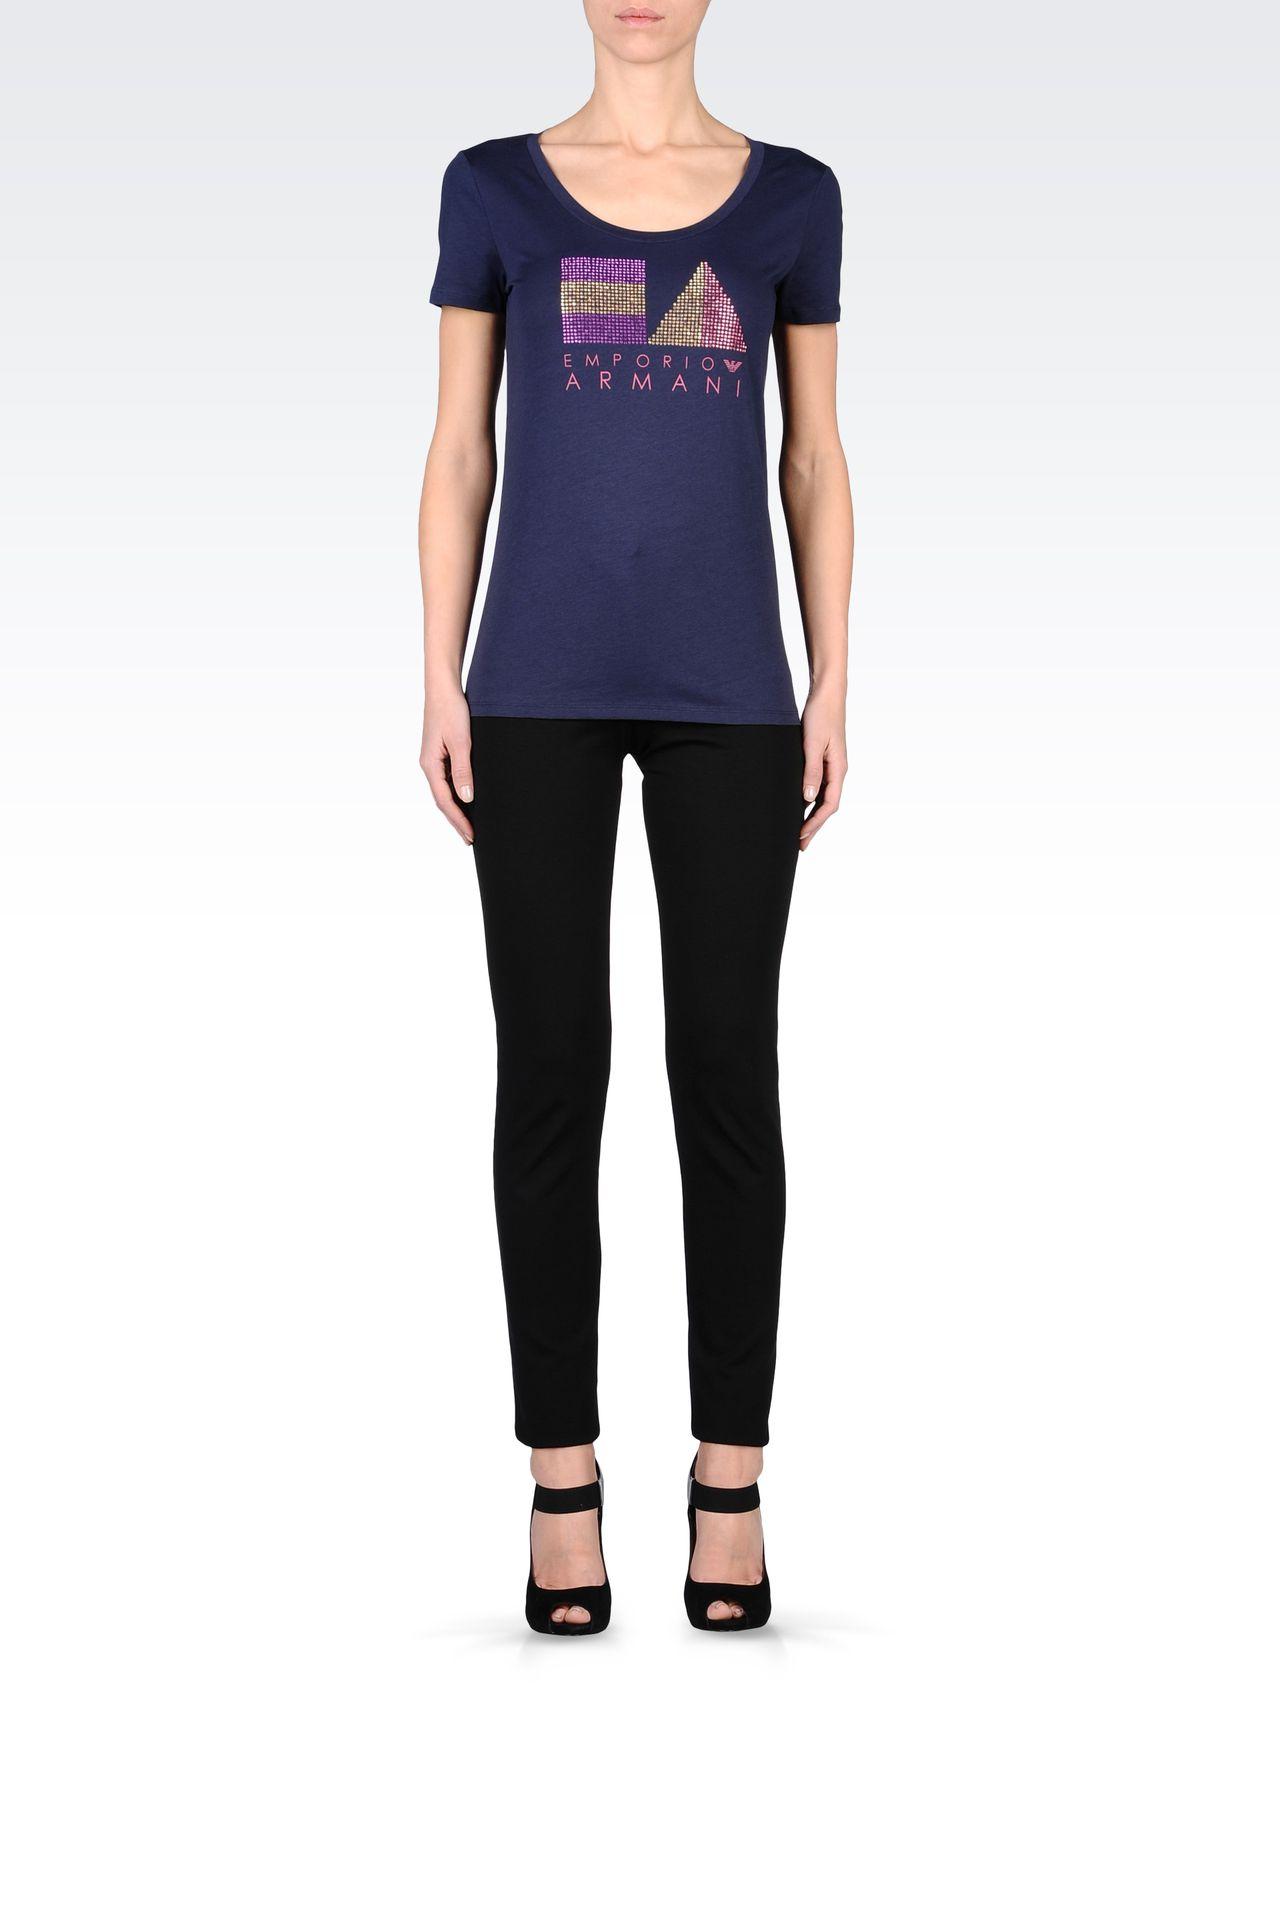 COTTON T-SHIRT WITH RHINESTONES: Short-sleeve t-shirts Women by Armani - 0